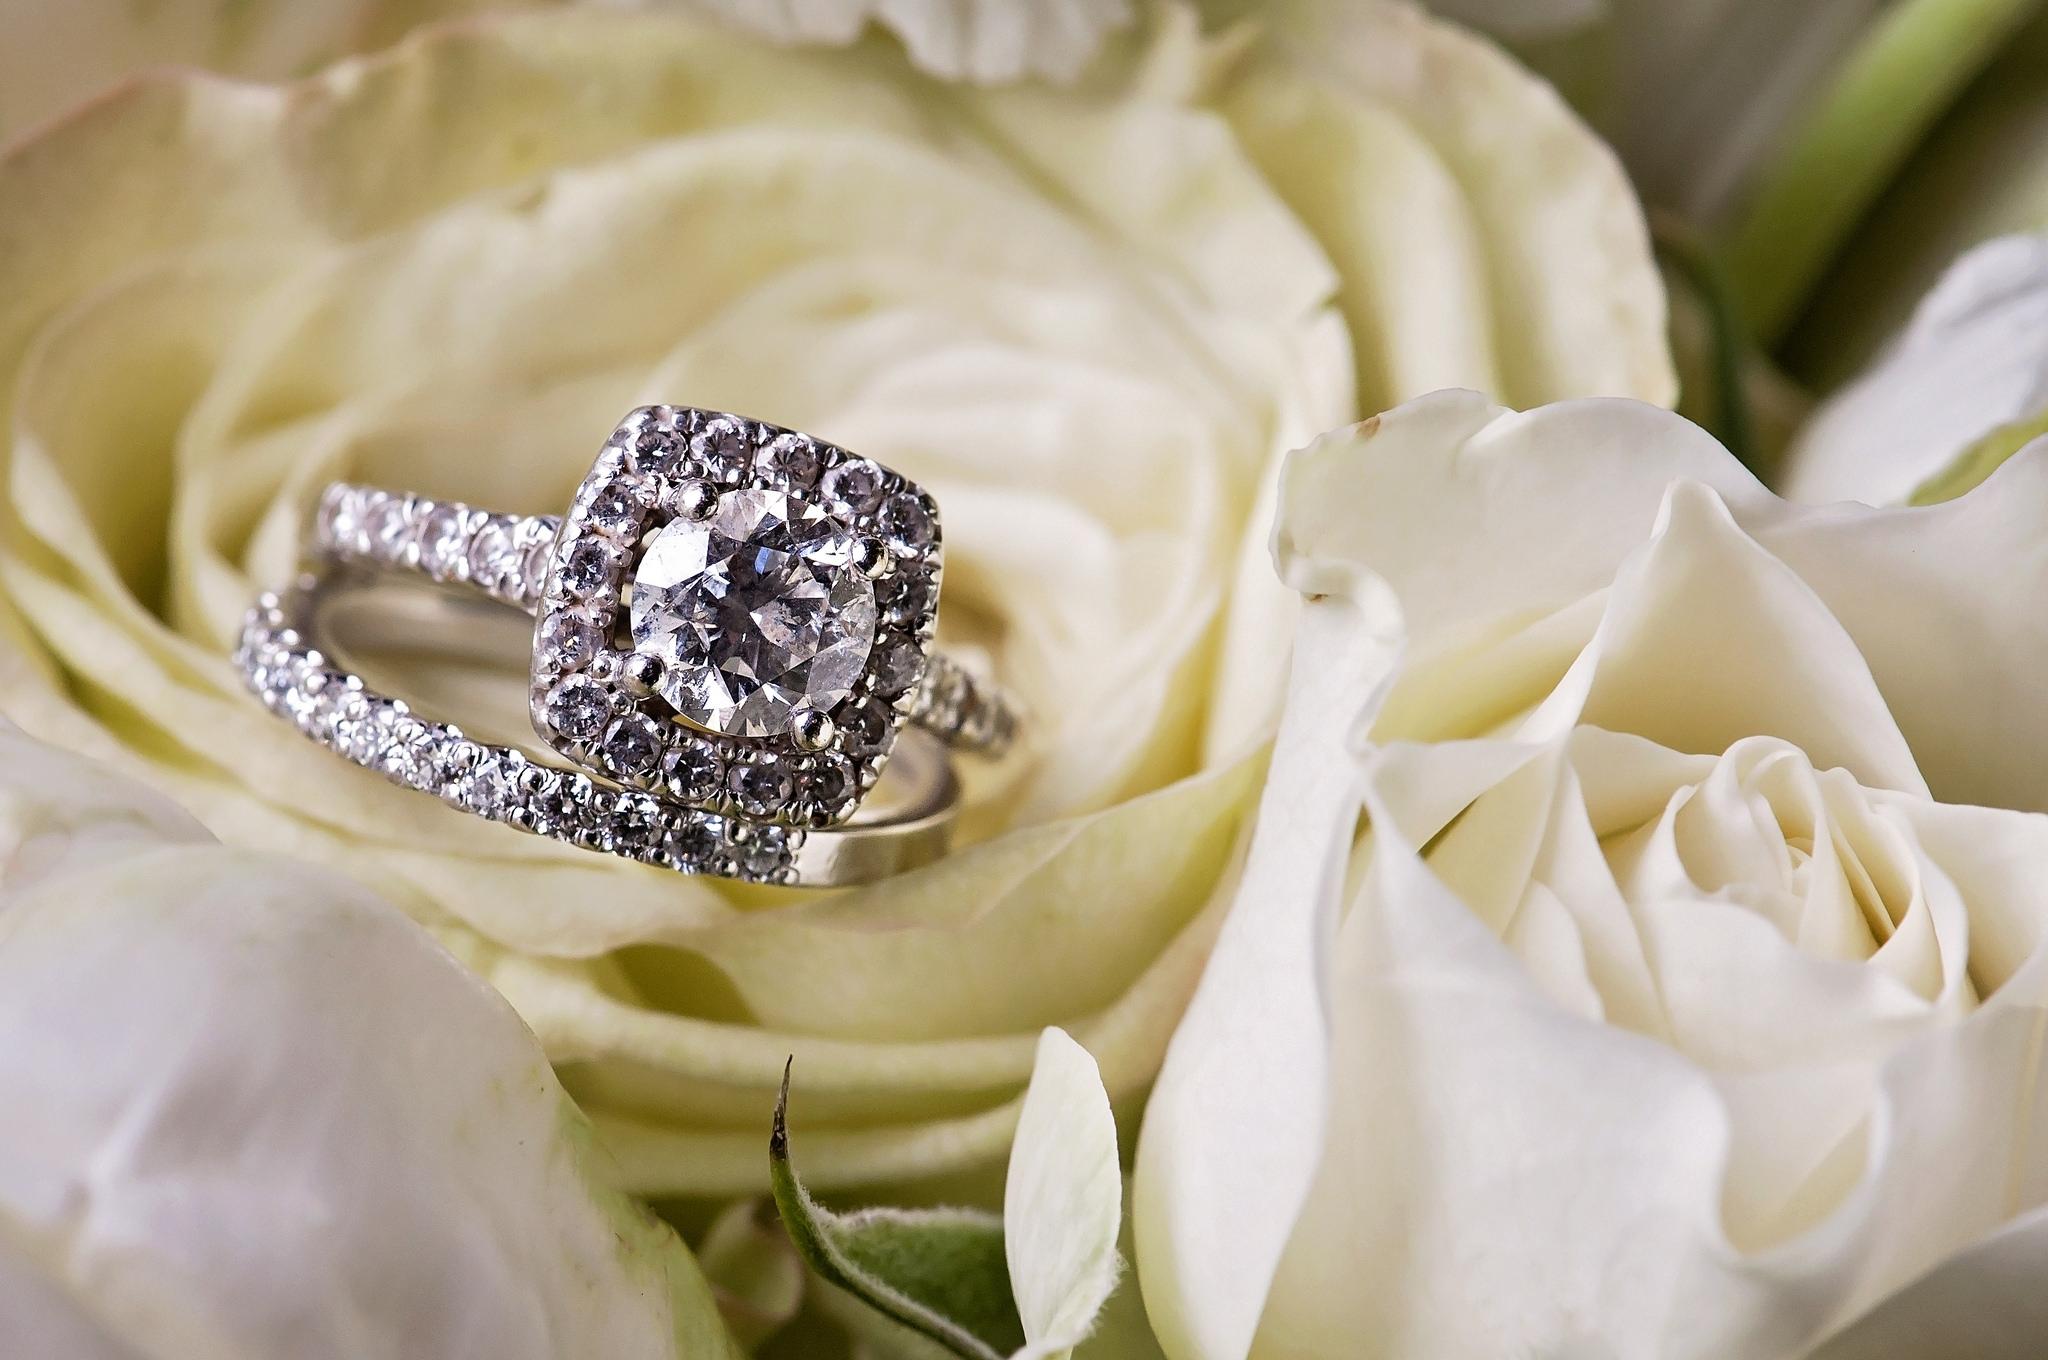 kristine_wedding_rings_spiritedtable_photo10.jpg